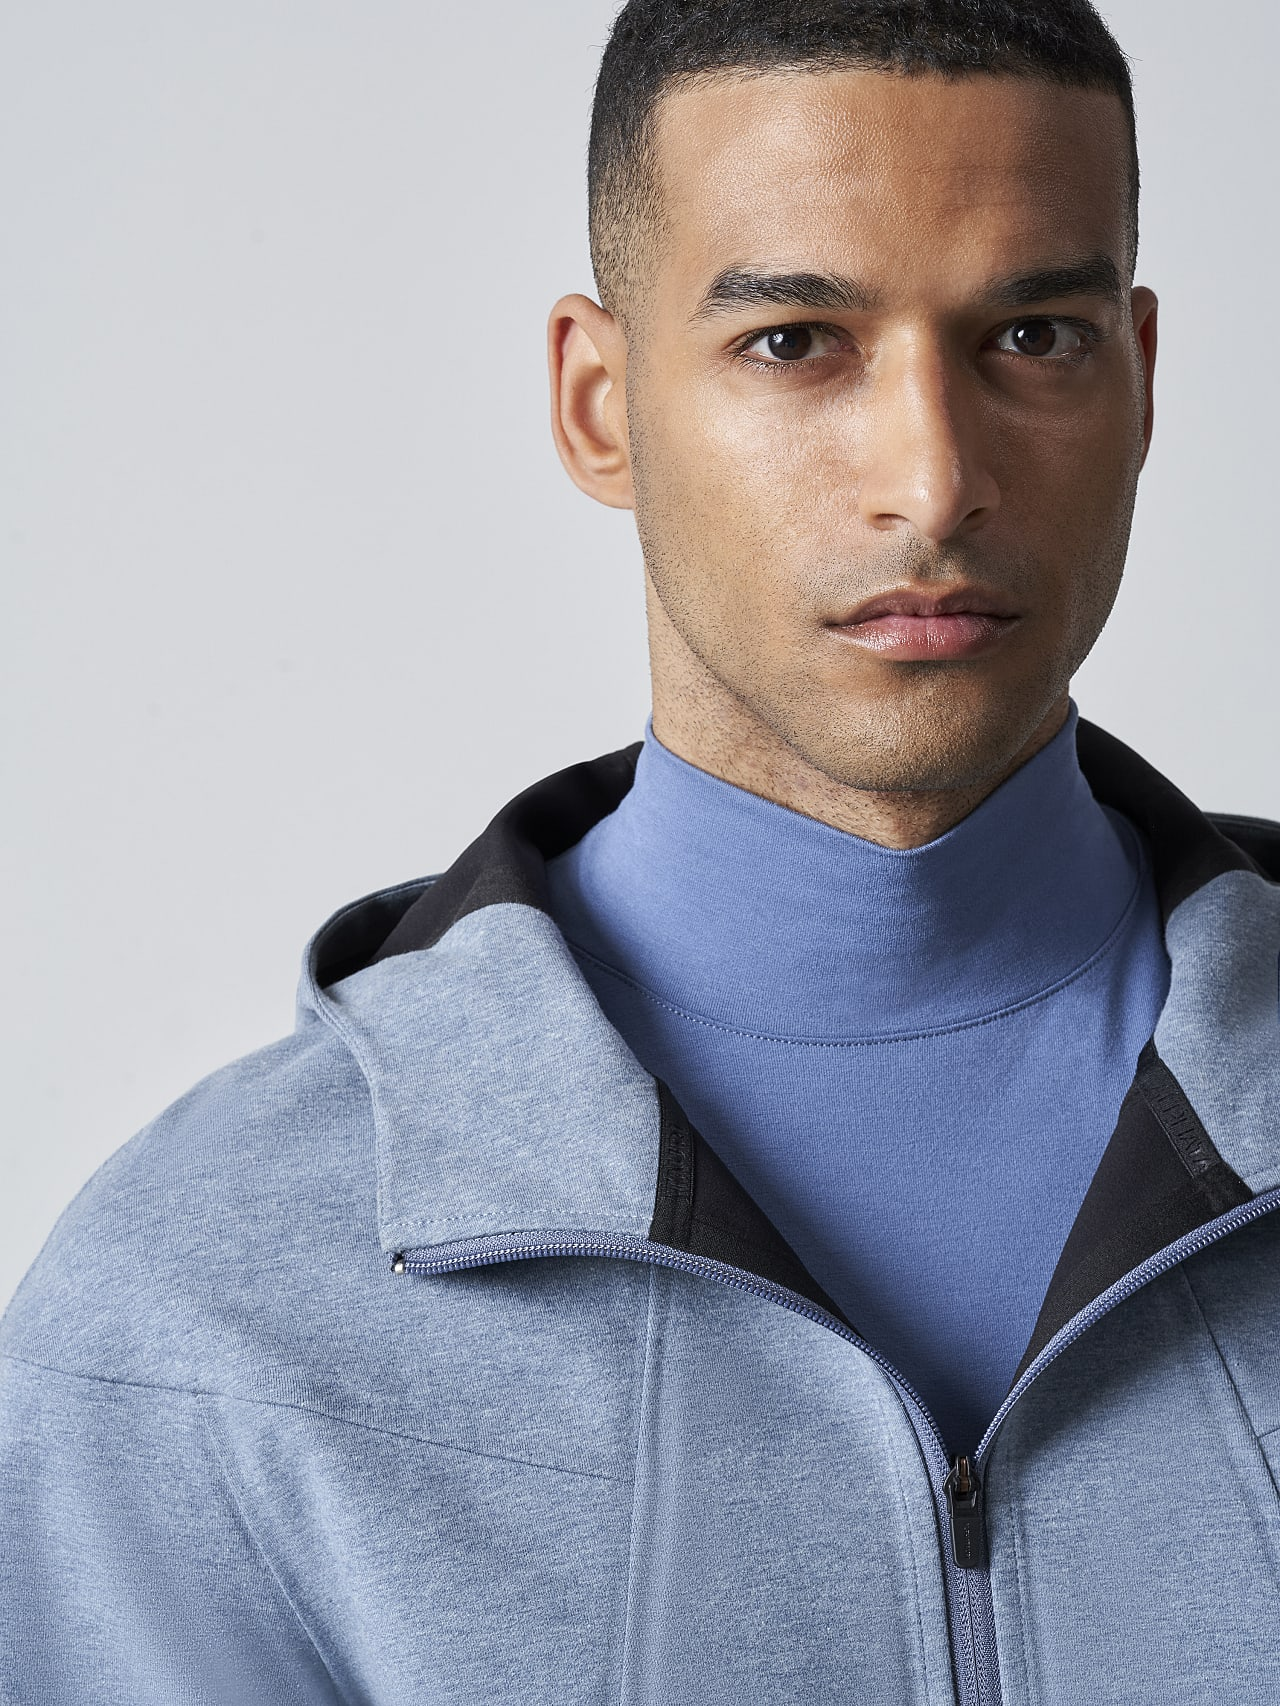 SROTE V1.Y5.02 Waterproof Sweatjacket medium blue Right Alpha Tauri